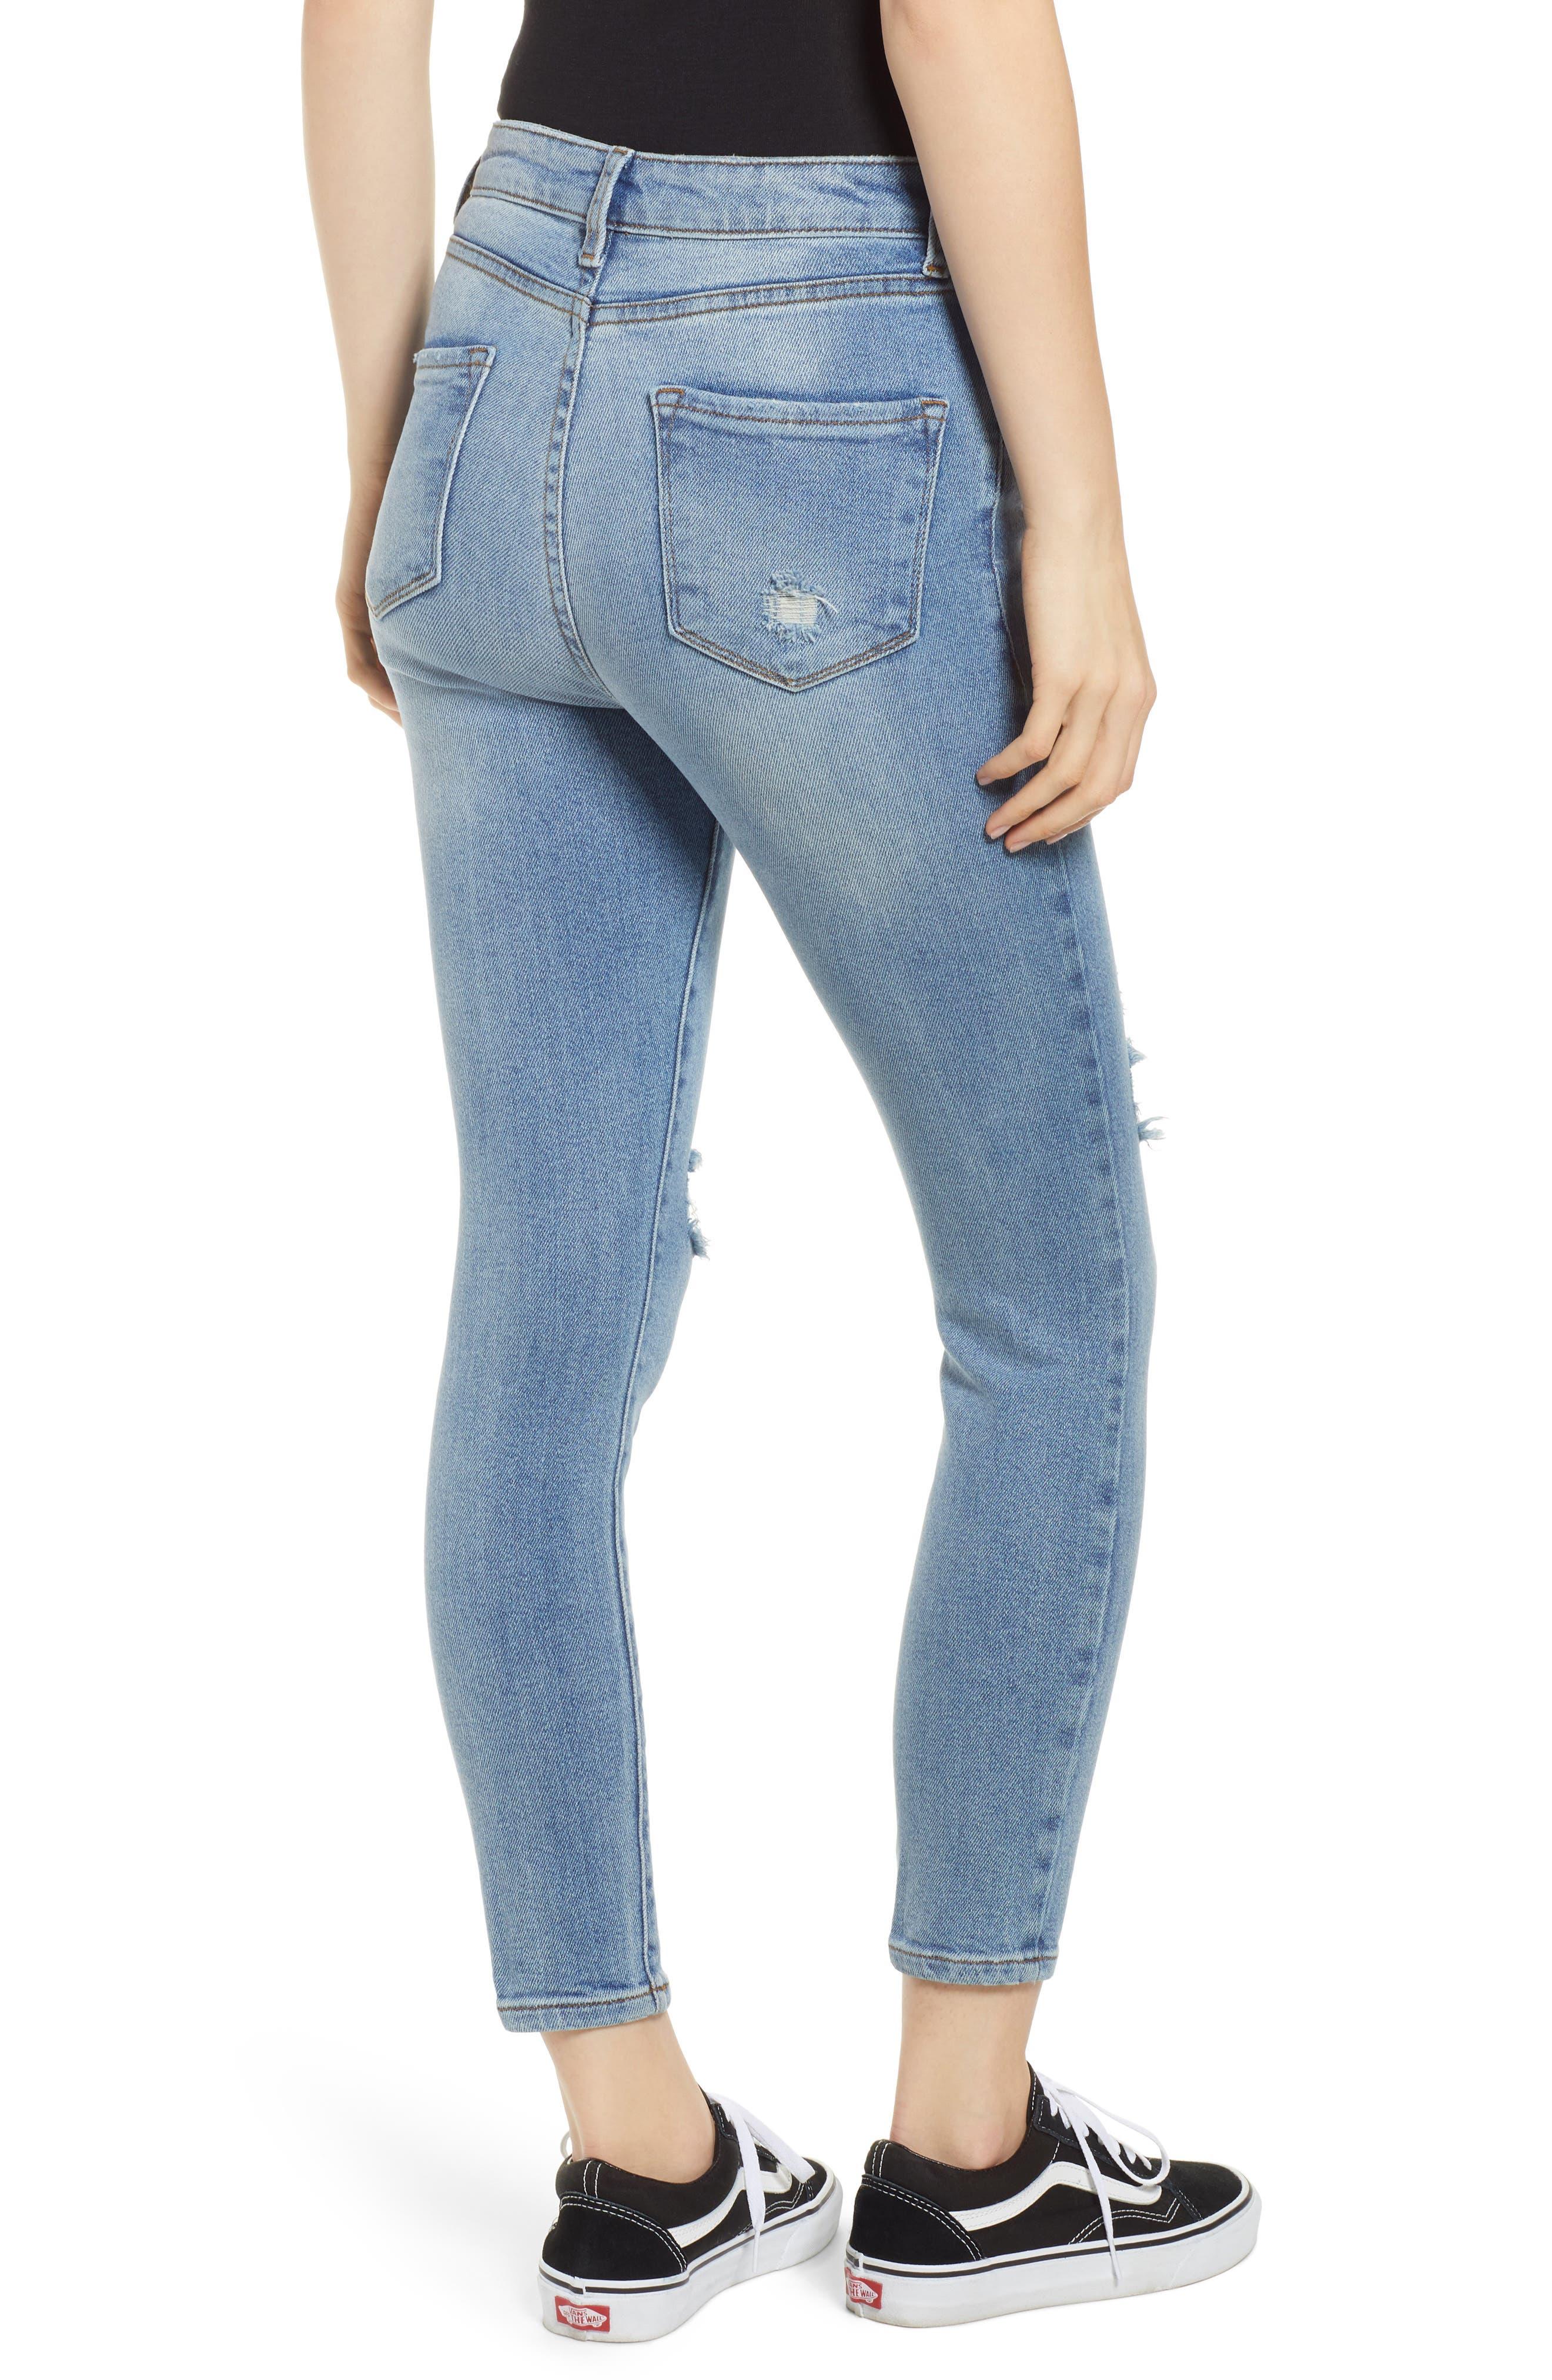 Brie High Waist Ripped Skinny Jeans,                             Alternate thumbnail 2, color,                             BRADFORD LIGHT WASH